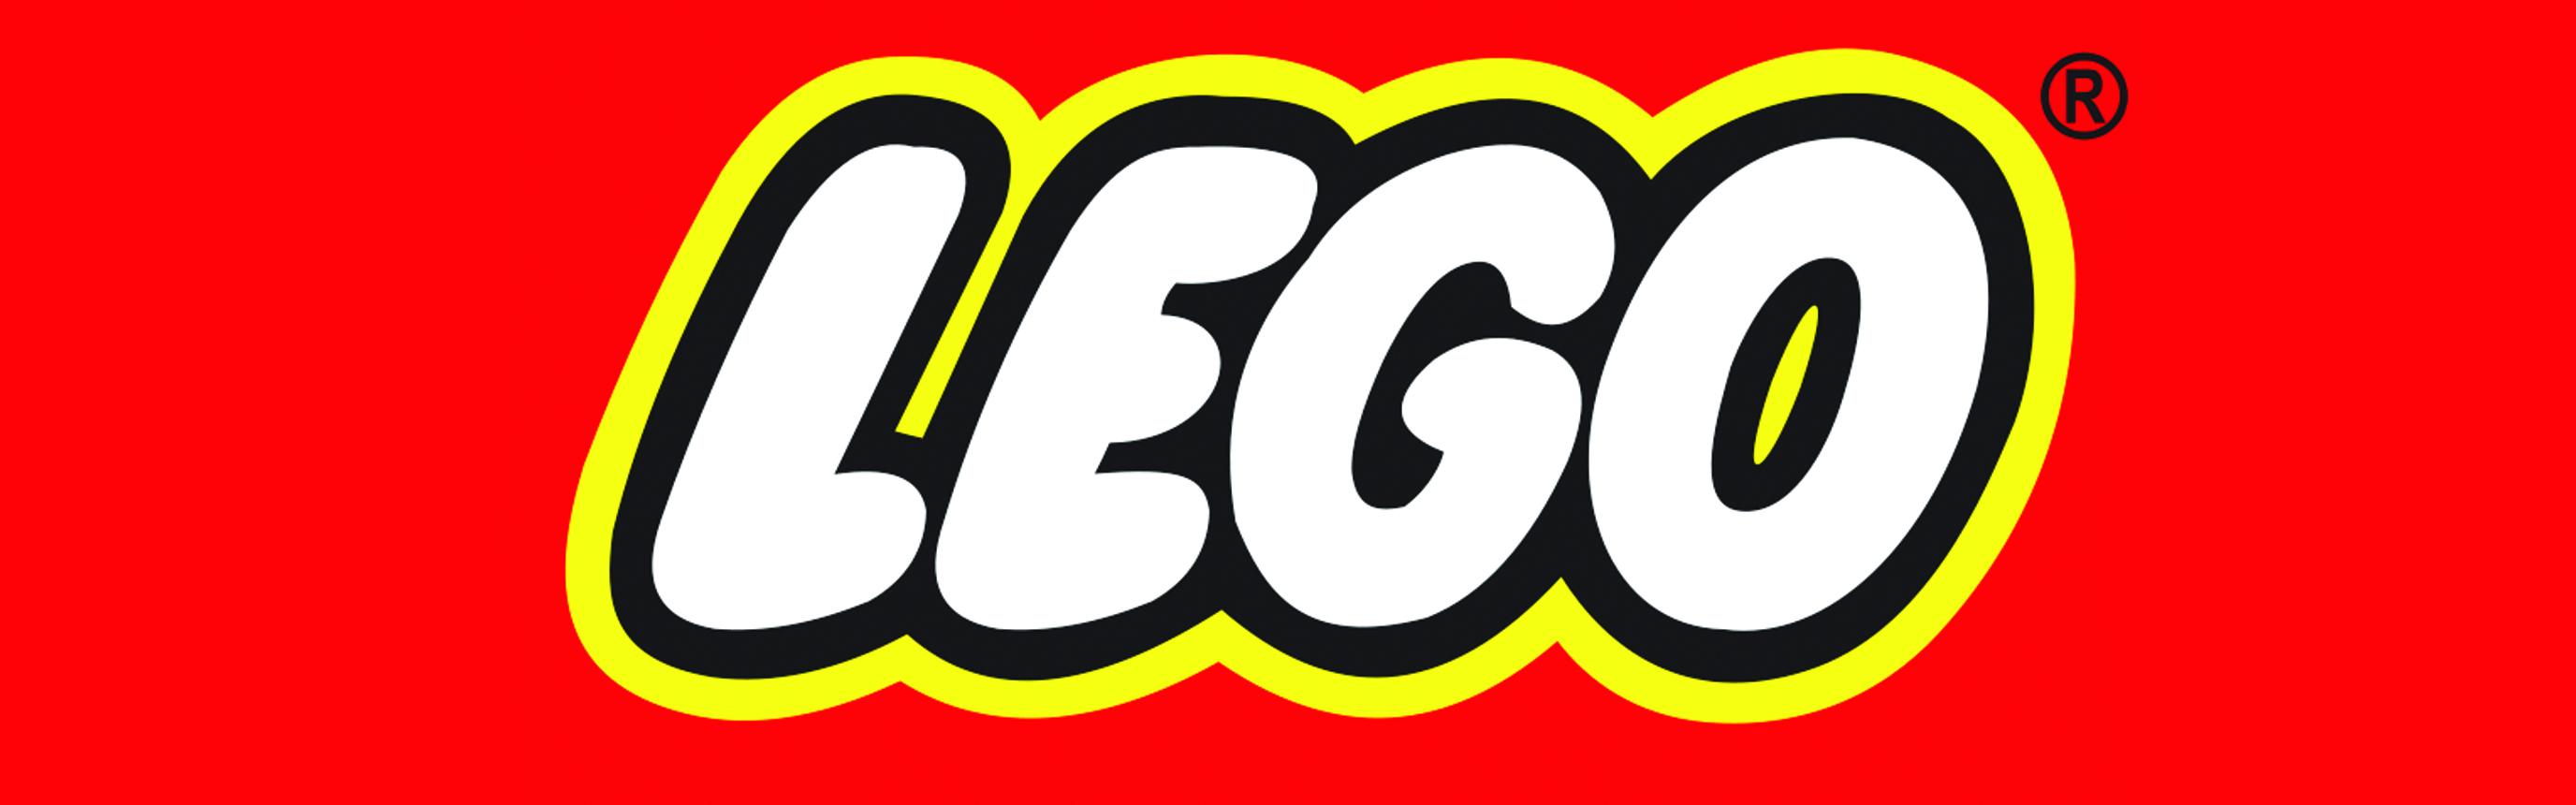 lego clip art. lego logo clip art clipart best. lego clipart.